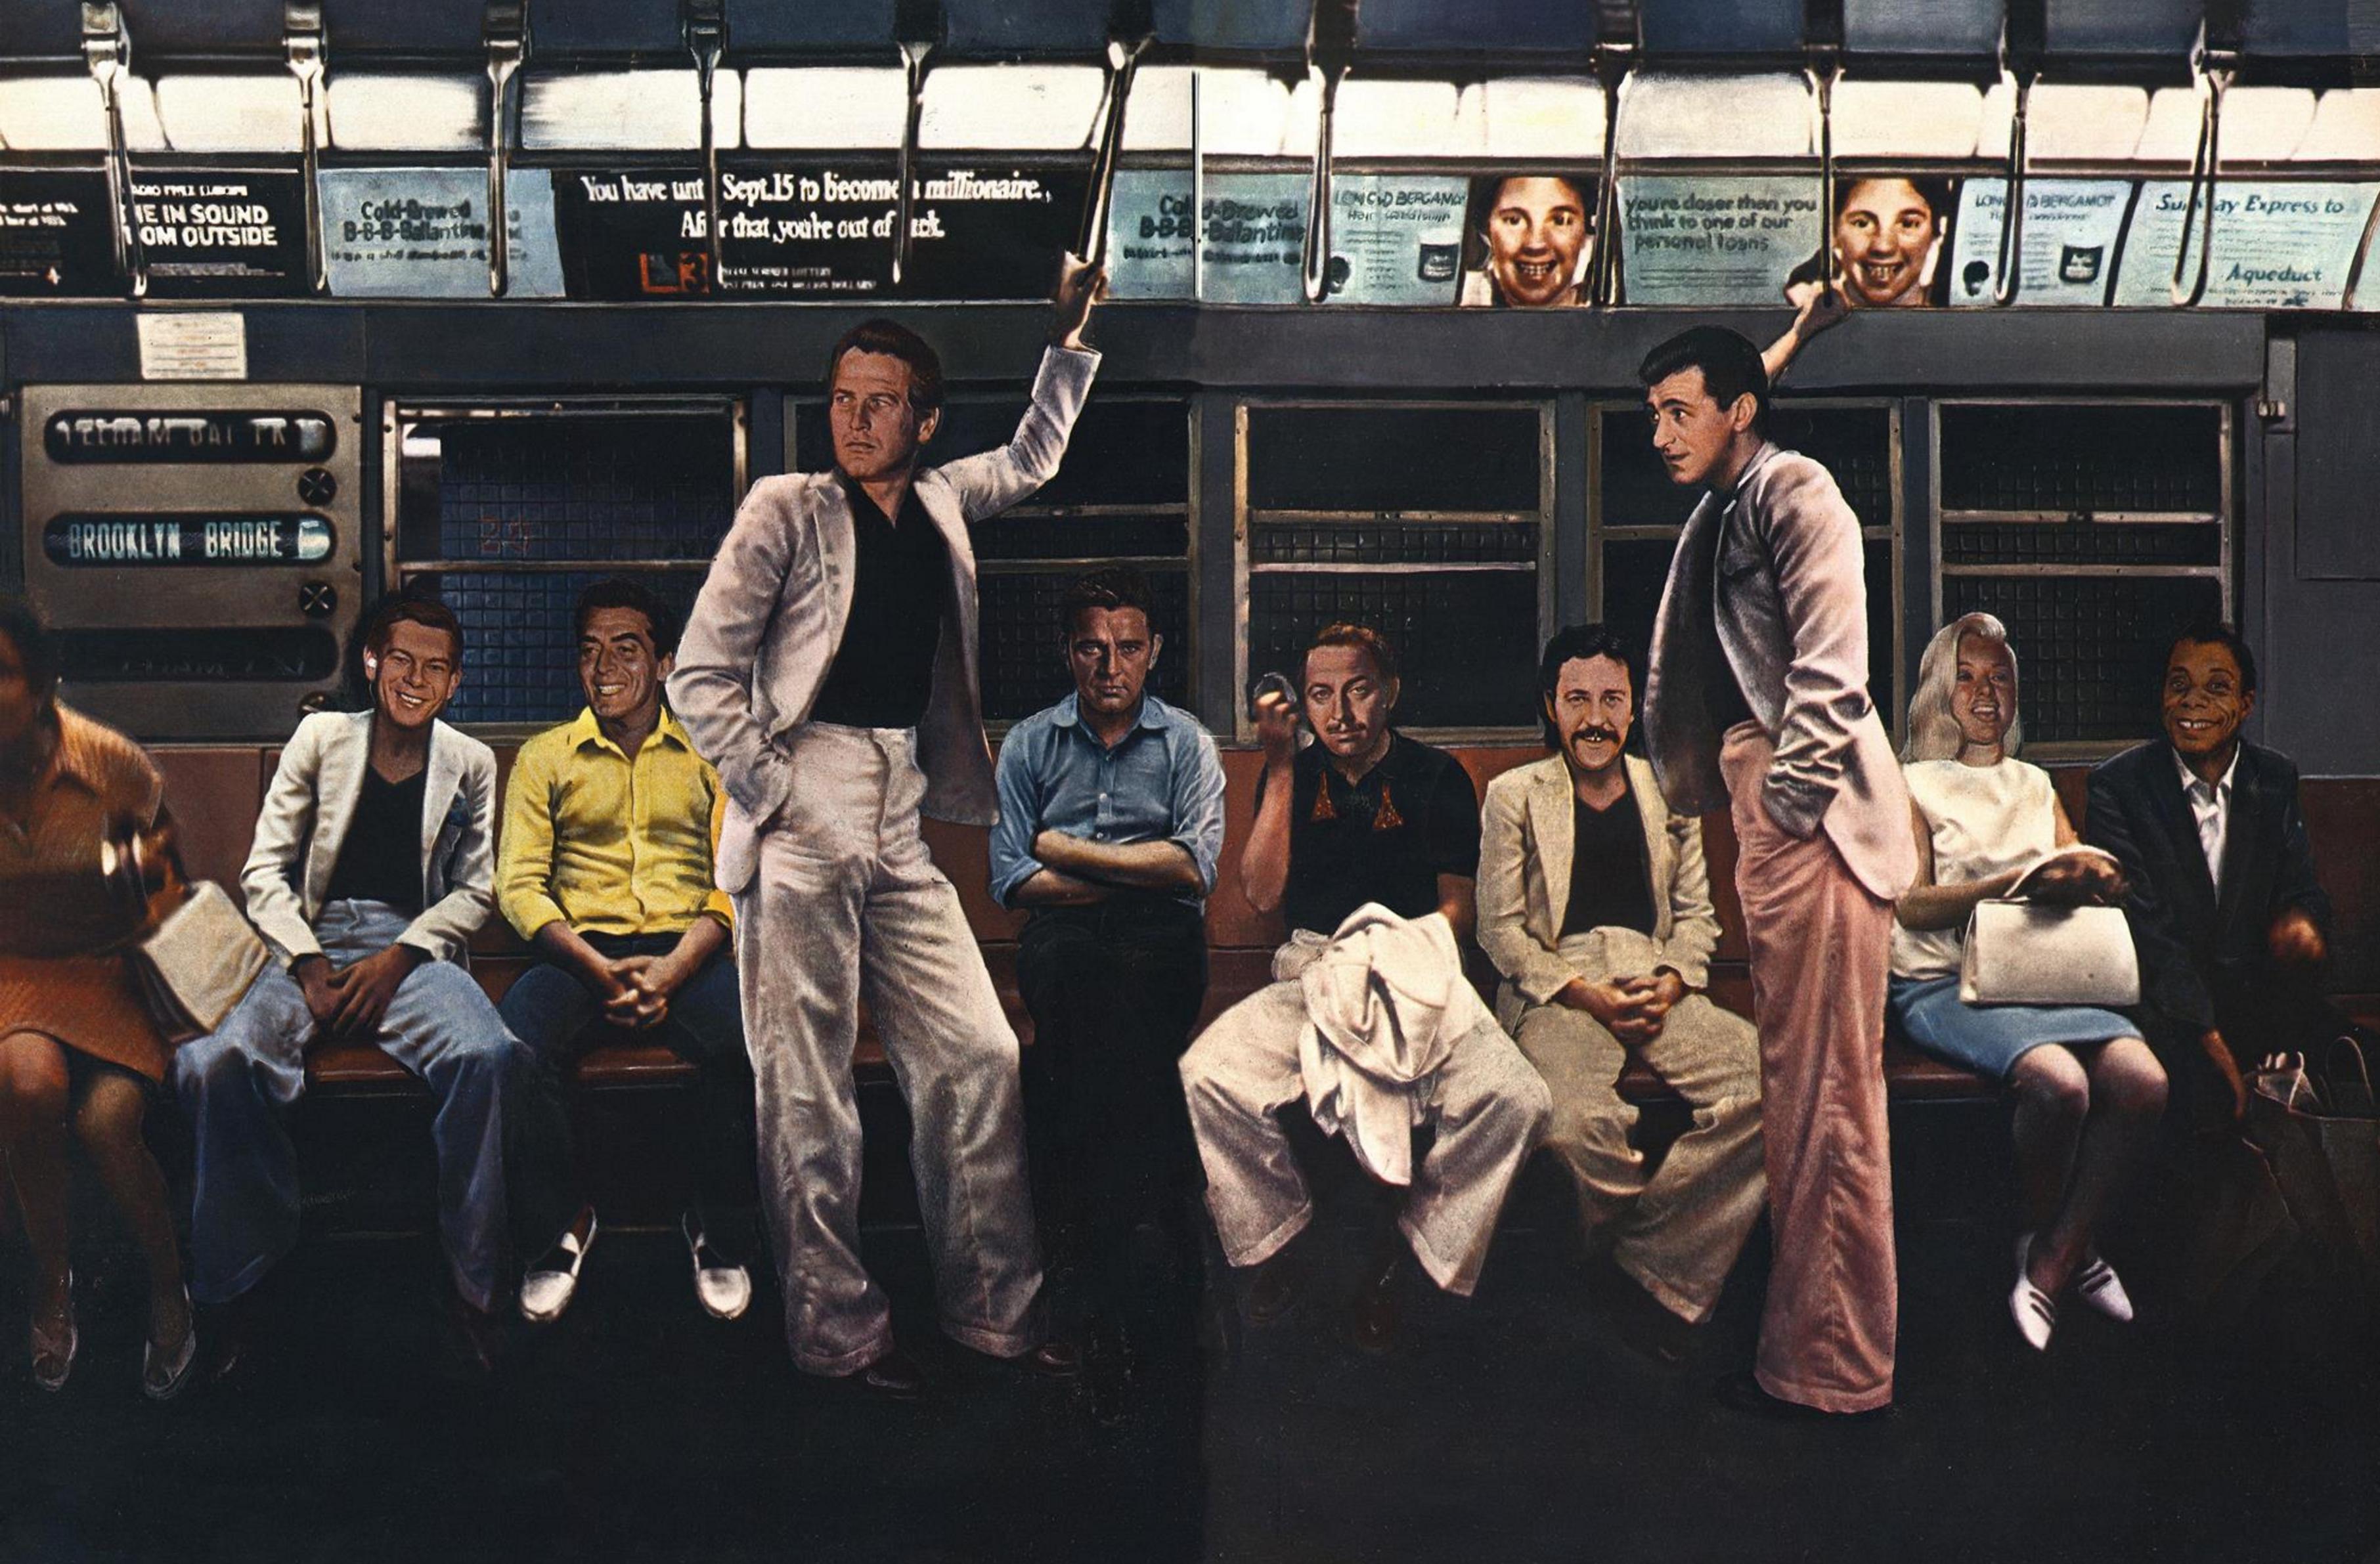 Jean Paul Goude 'Fame Train', Esquire.png